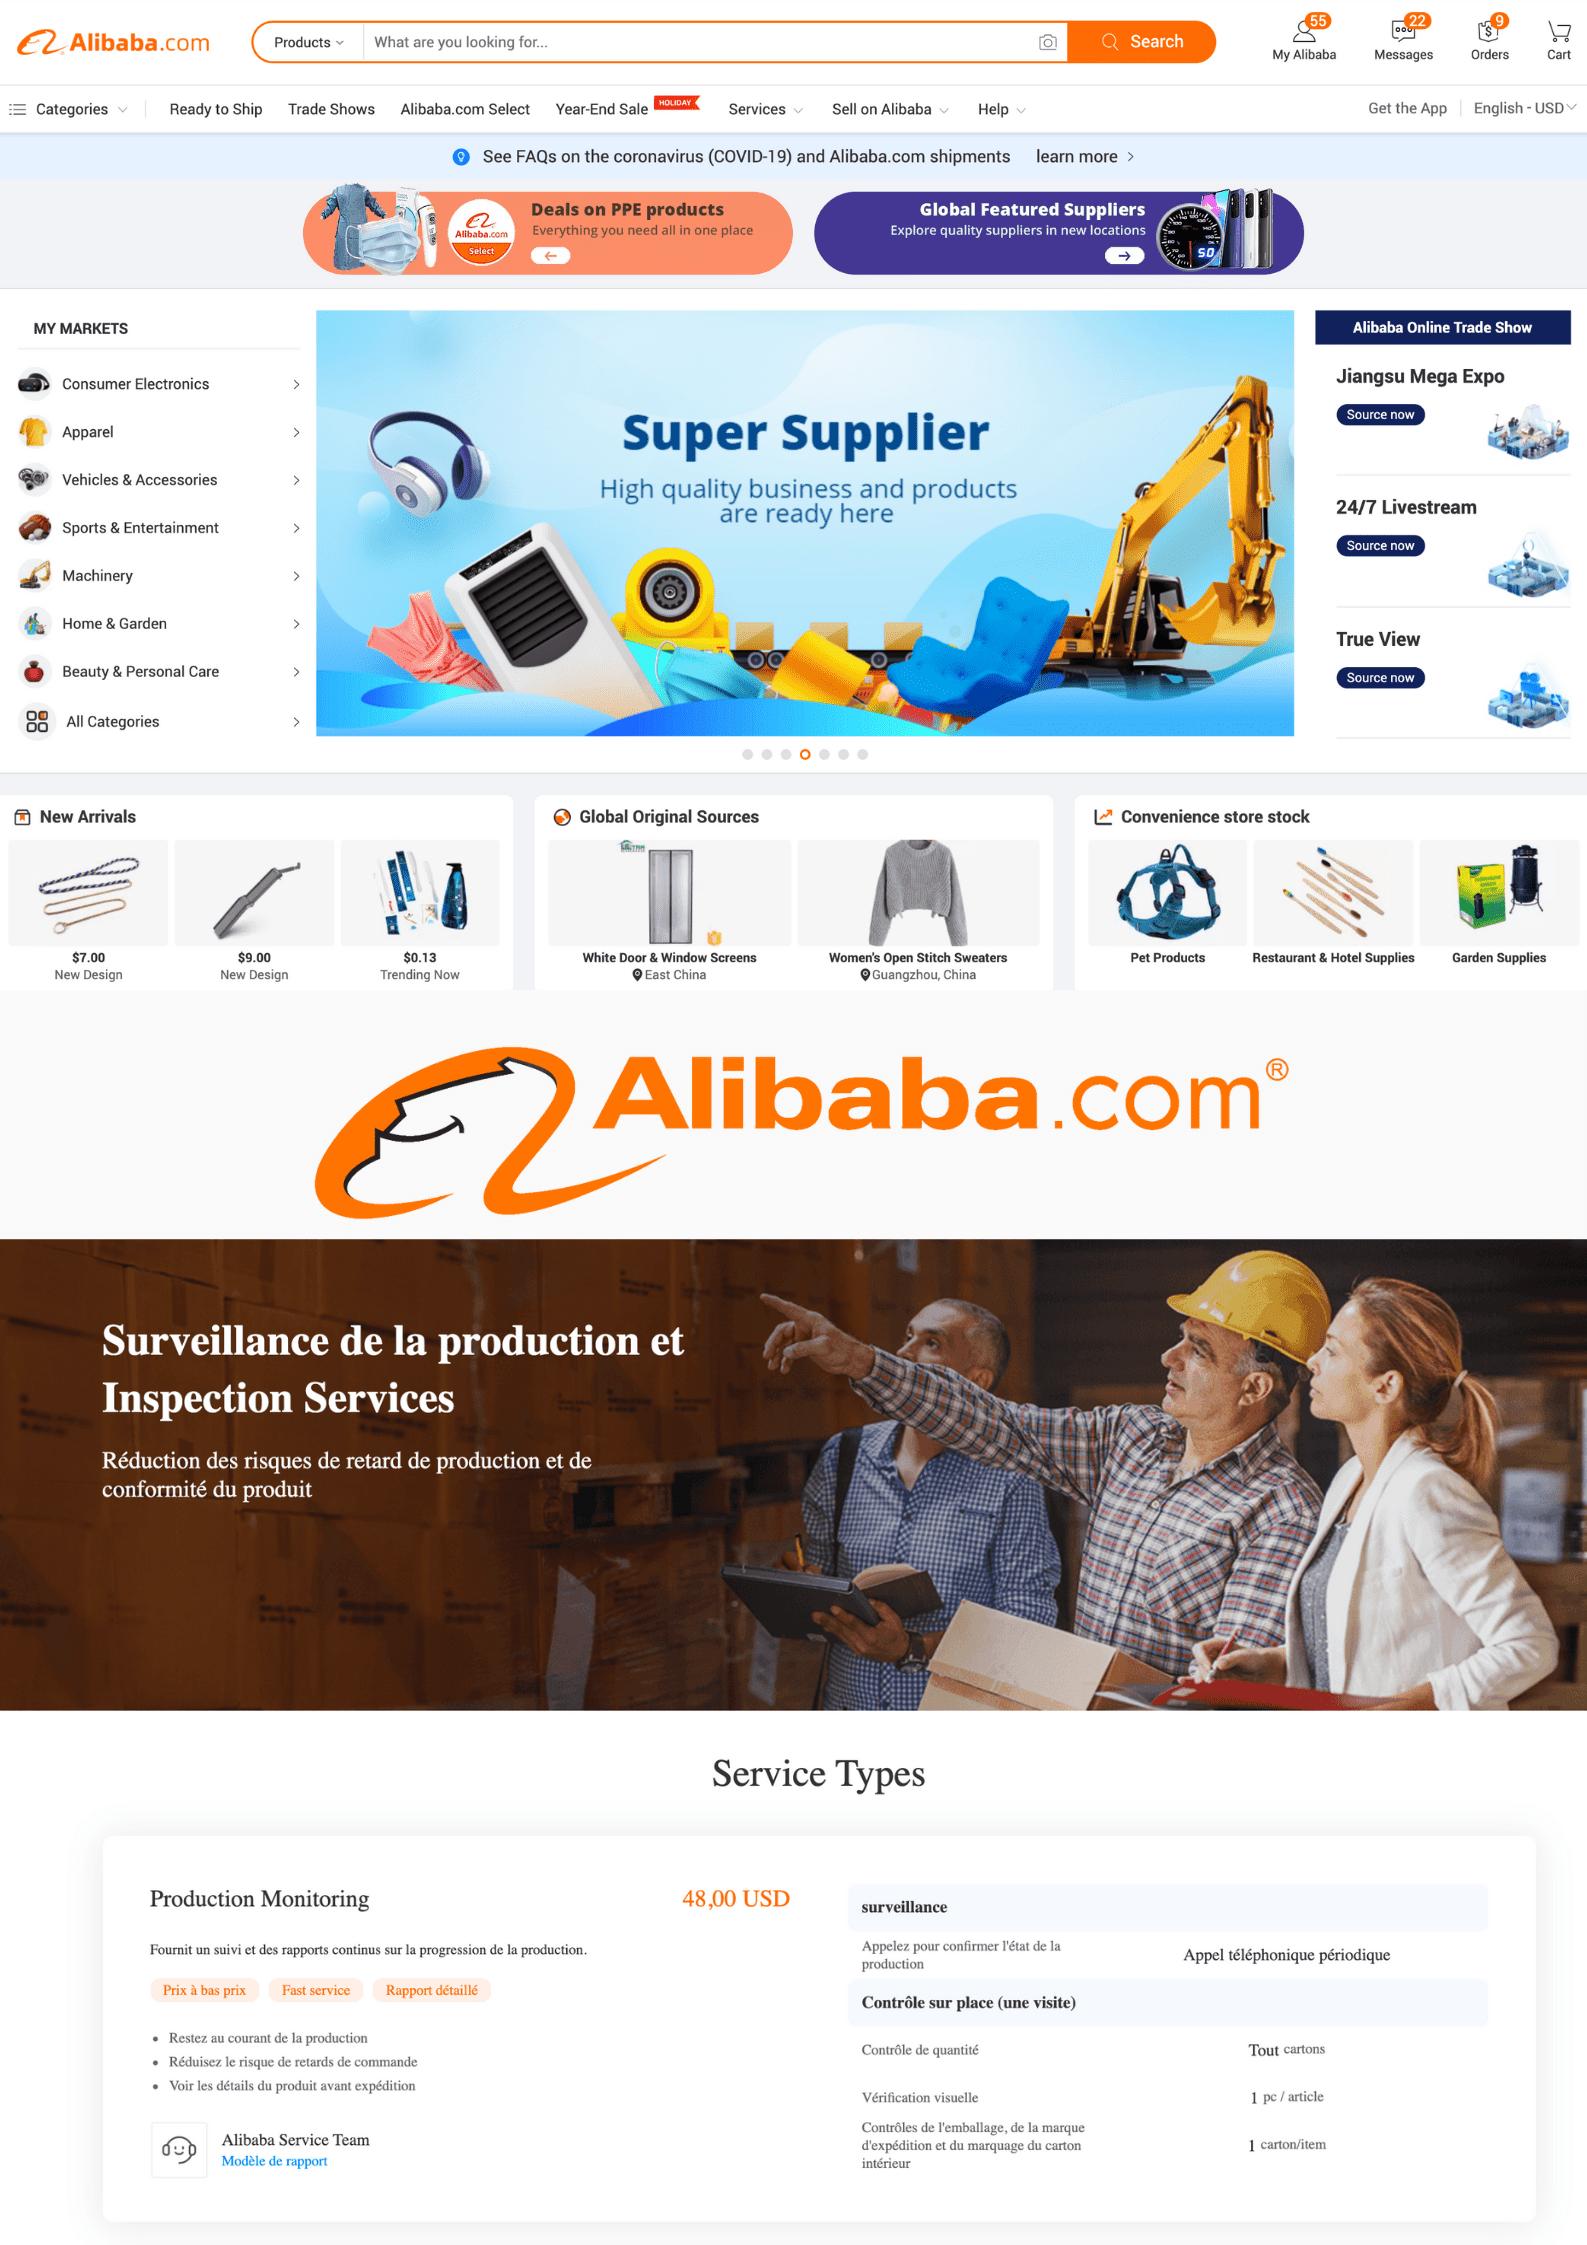 alibaba francais code reduction